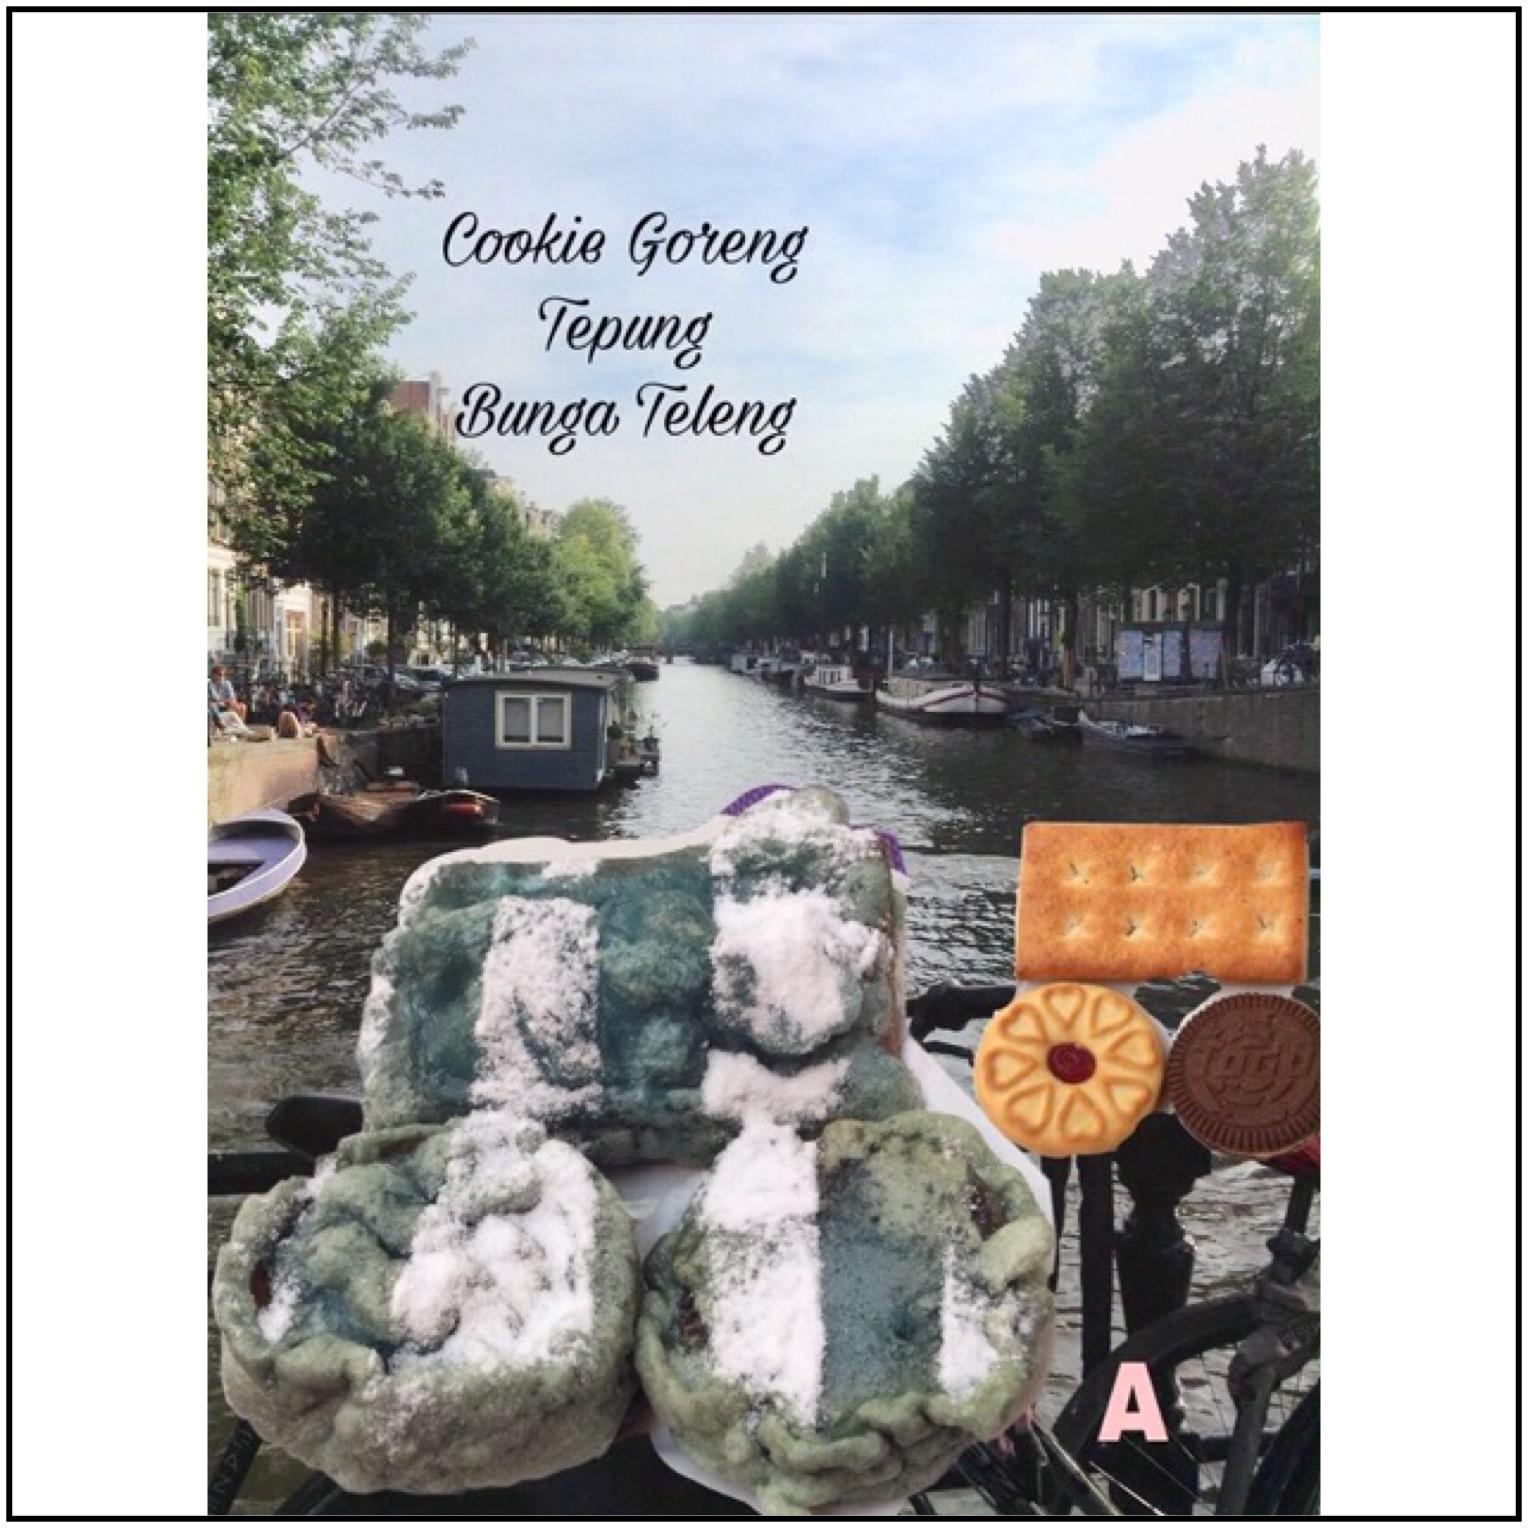 Resep Cookie Goreng Tepung Bunga Teleng